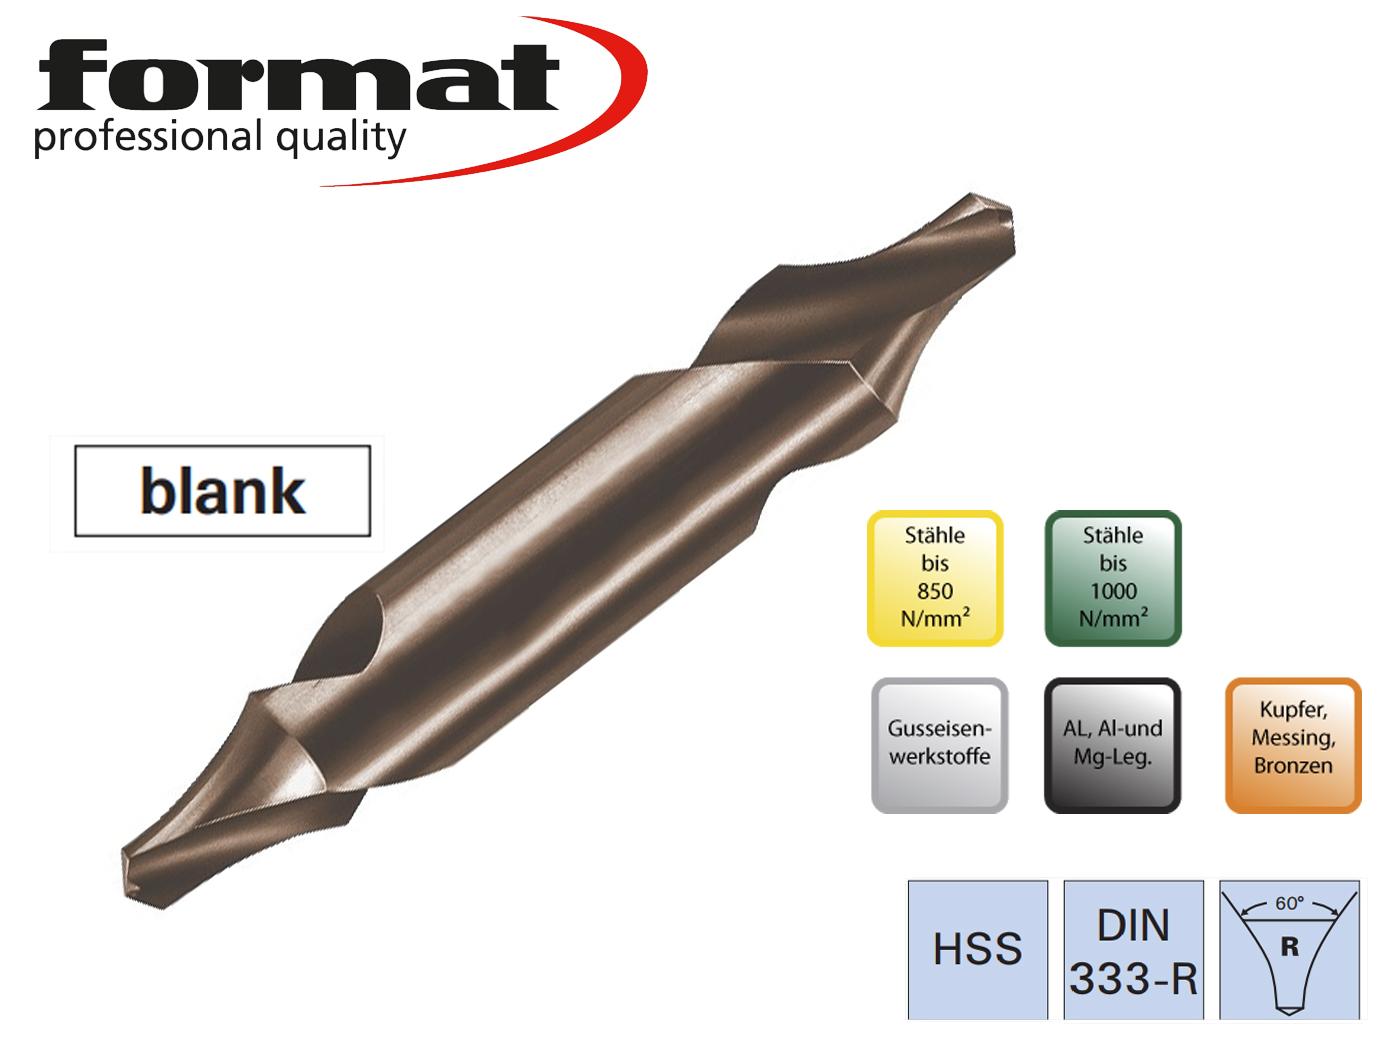 Centreerboren DIN 333 R FORMAT | DKMTools - DKM Tools